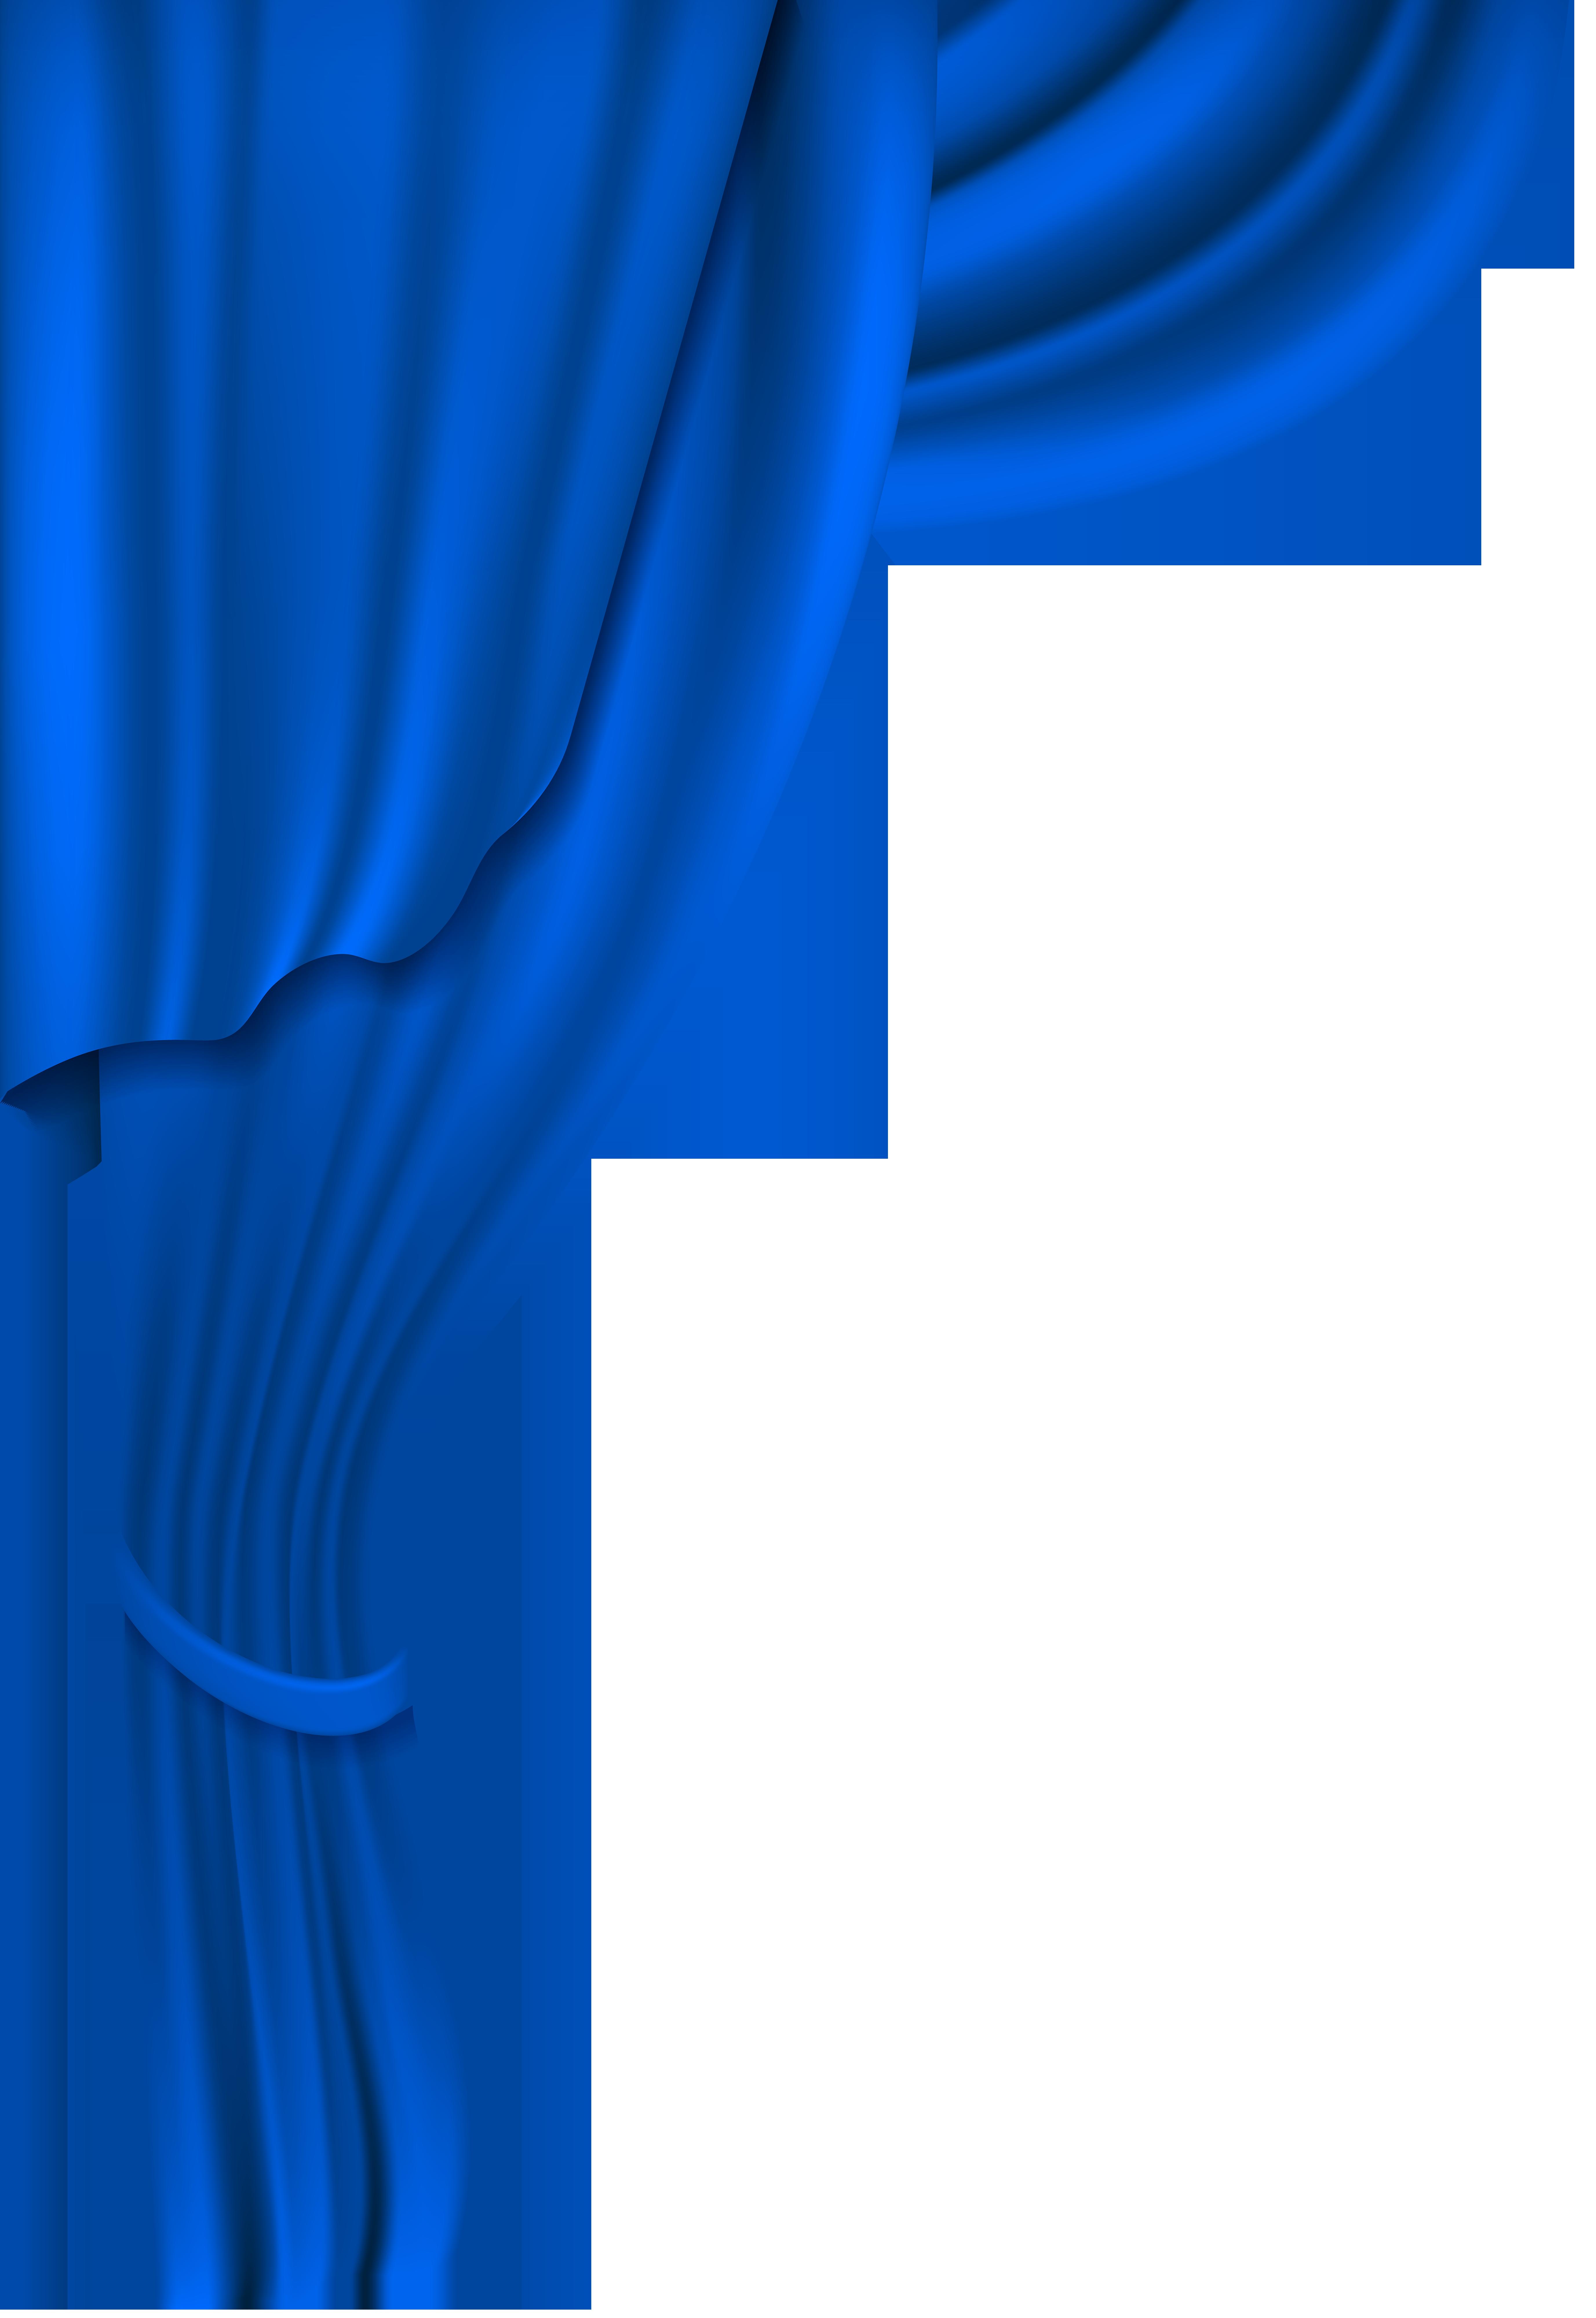 Curtain clipart cream. Blue transparent clip art